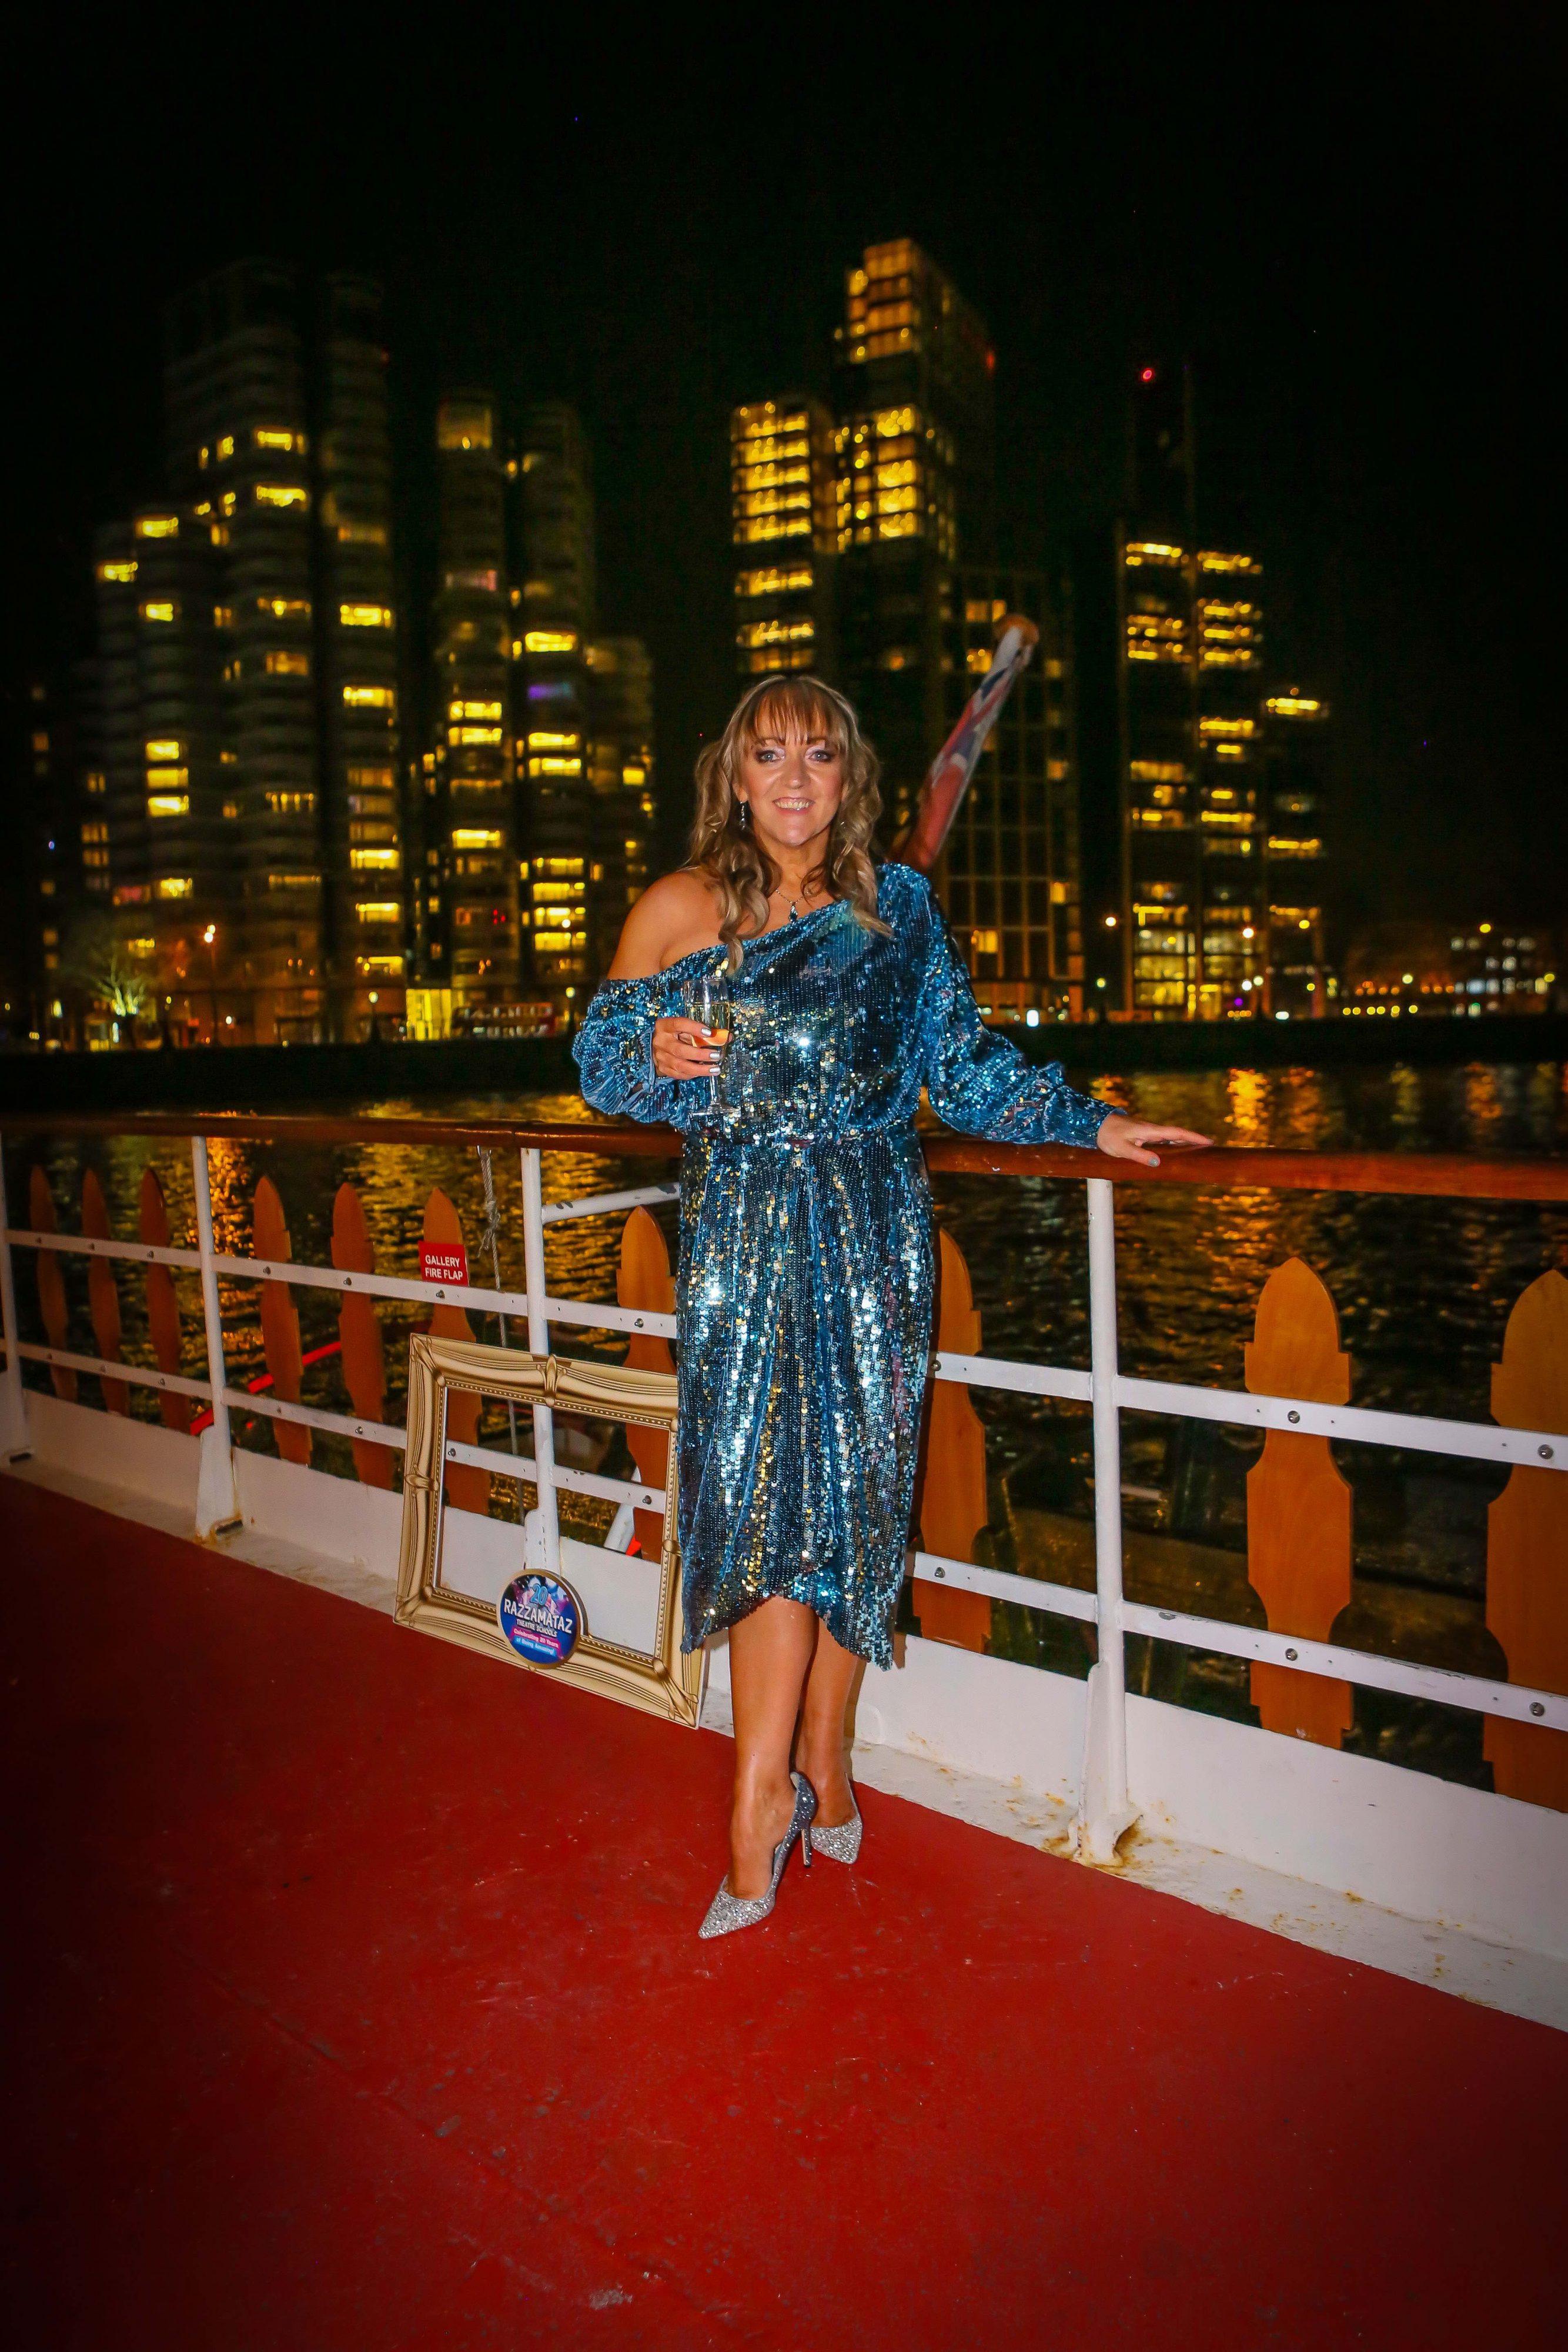 Denise Hutton Gosney - Winner of the Lifetime Achievement Award